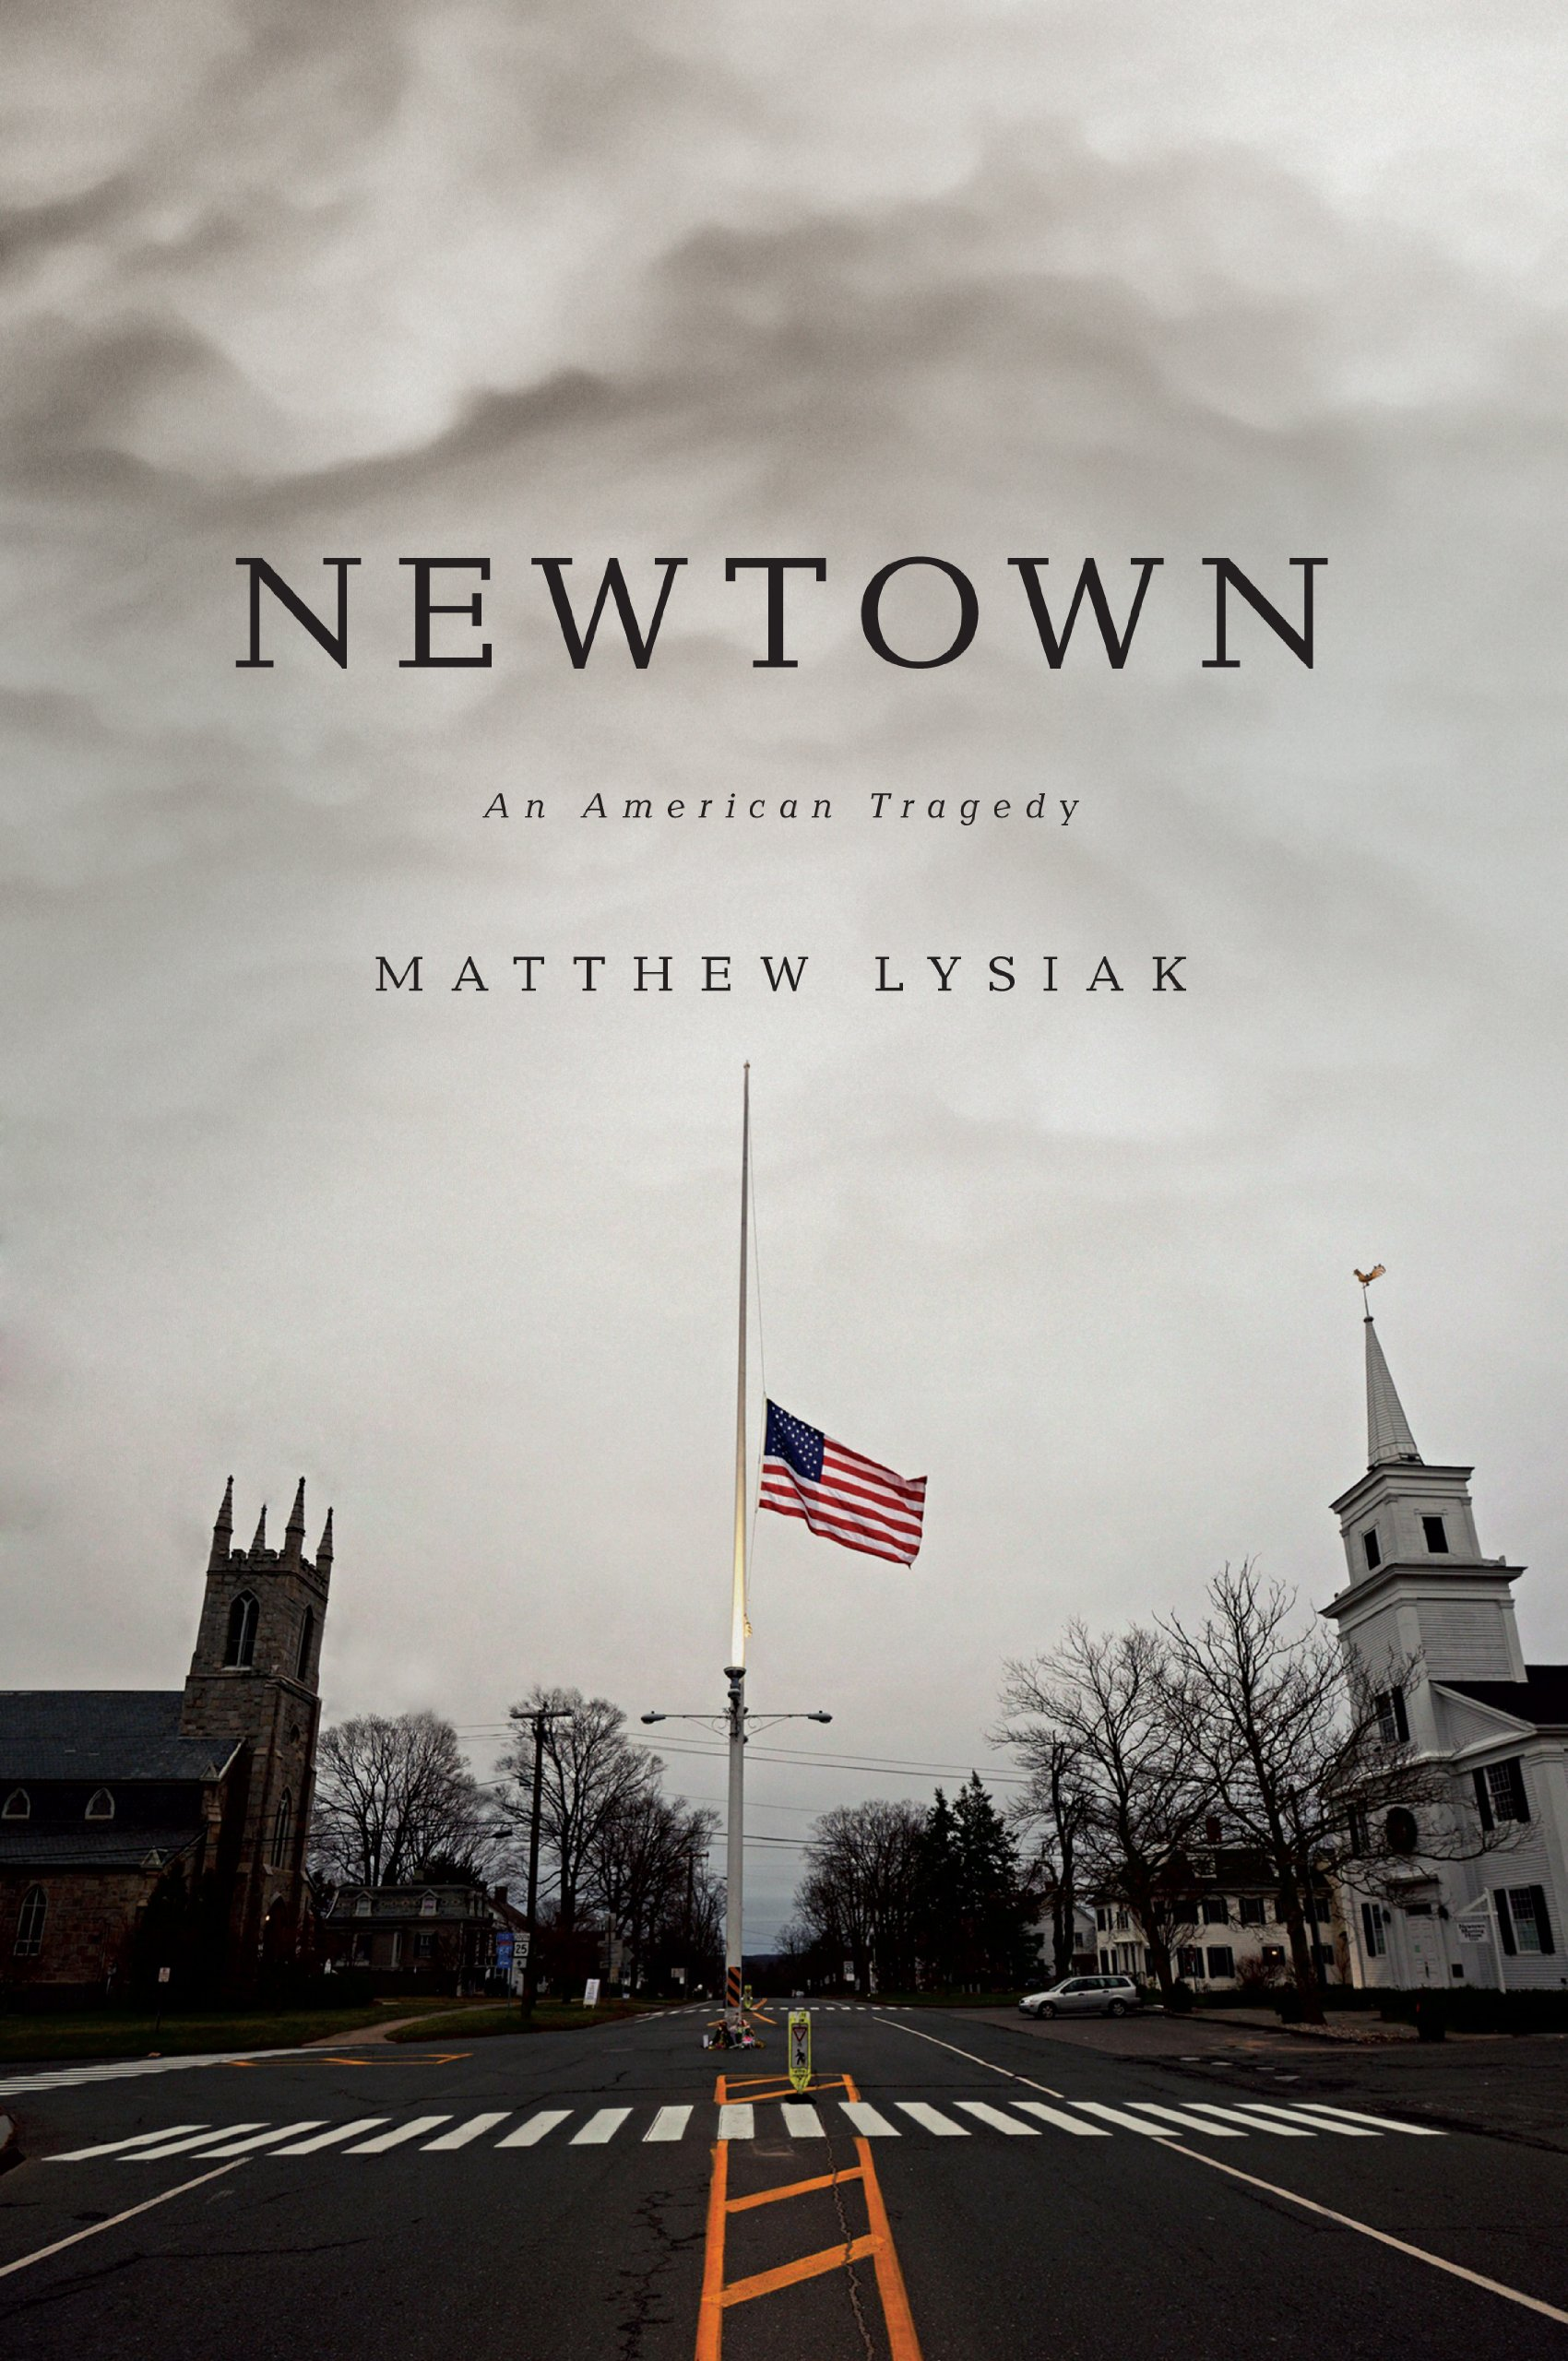 Read Online Newtown: An American Tragedy (Thorndike Press Large Print Nonfiction Series) ebook